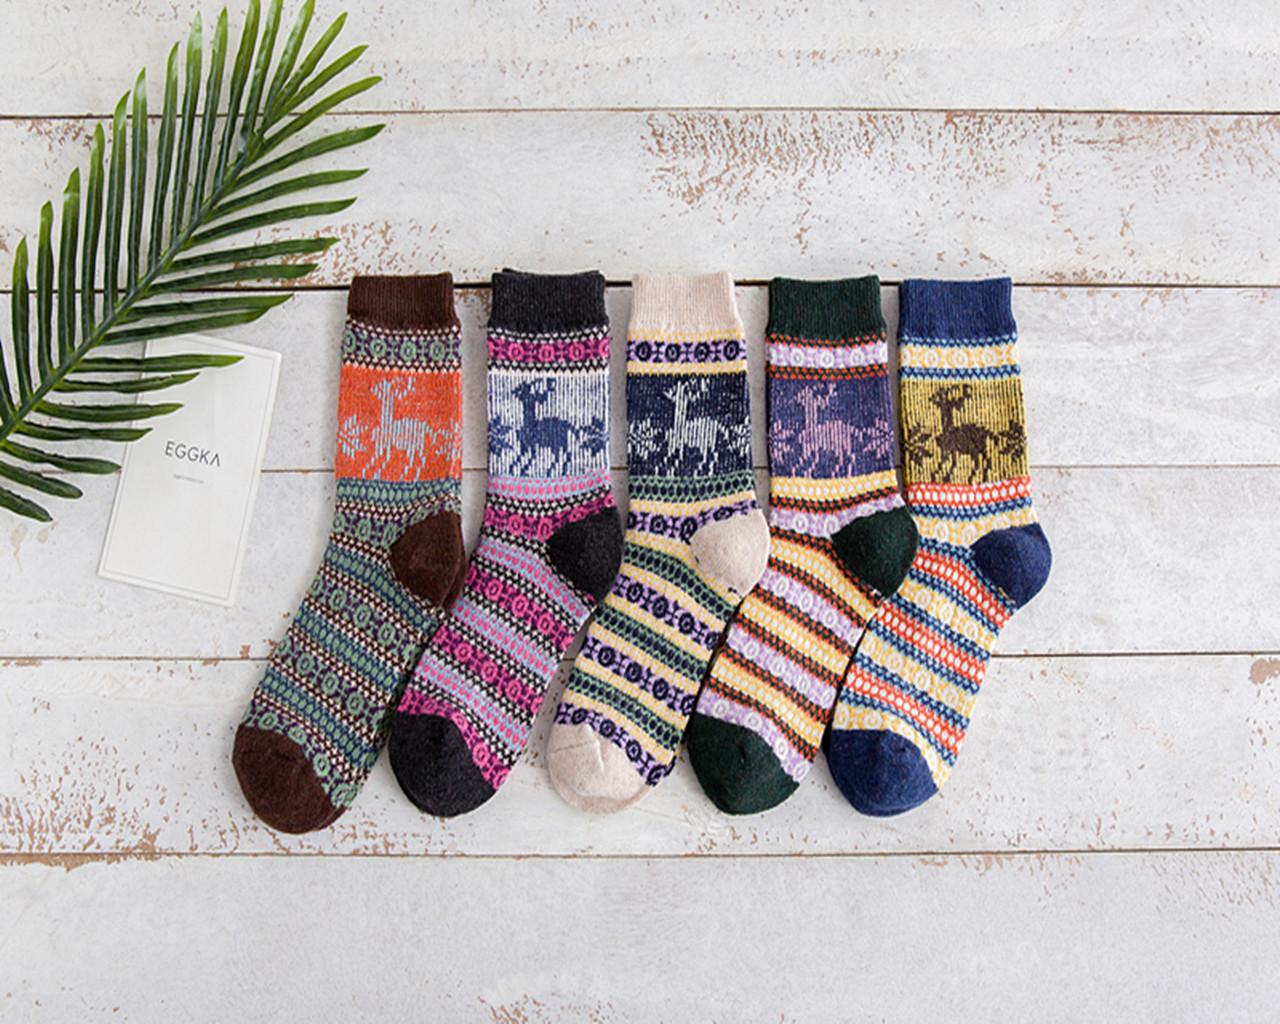 Різдвяні шкарпетки з оленями рождественские новогодние носки с оленями